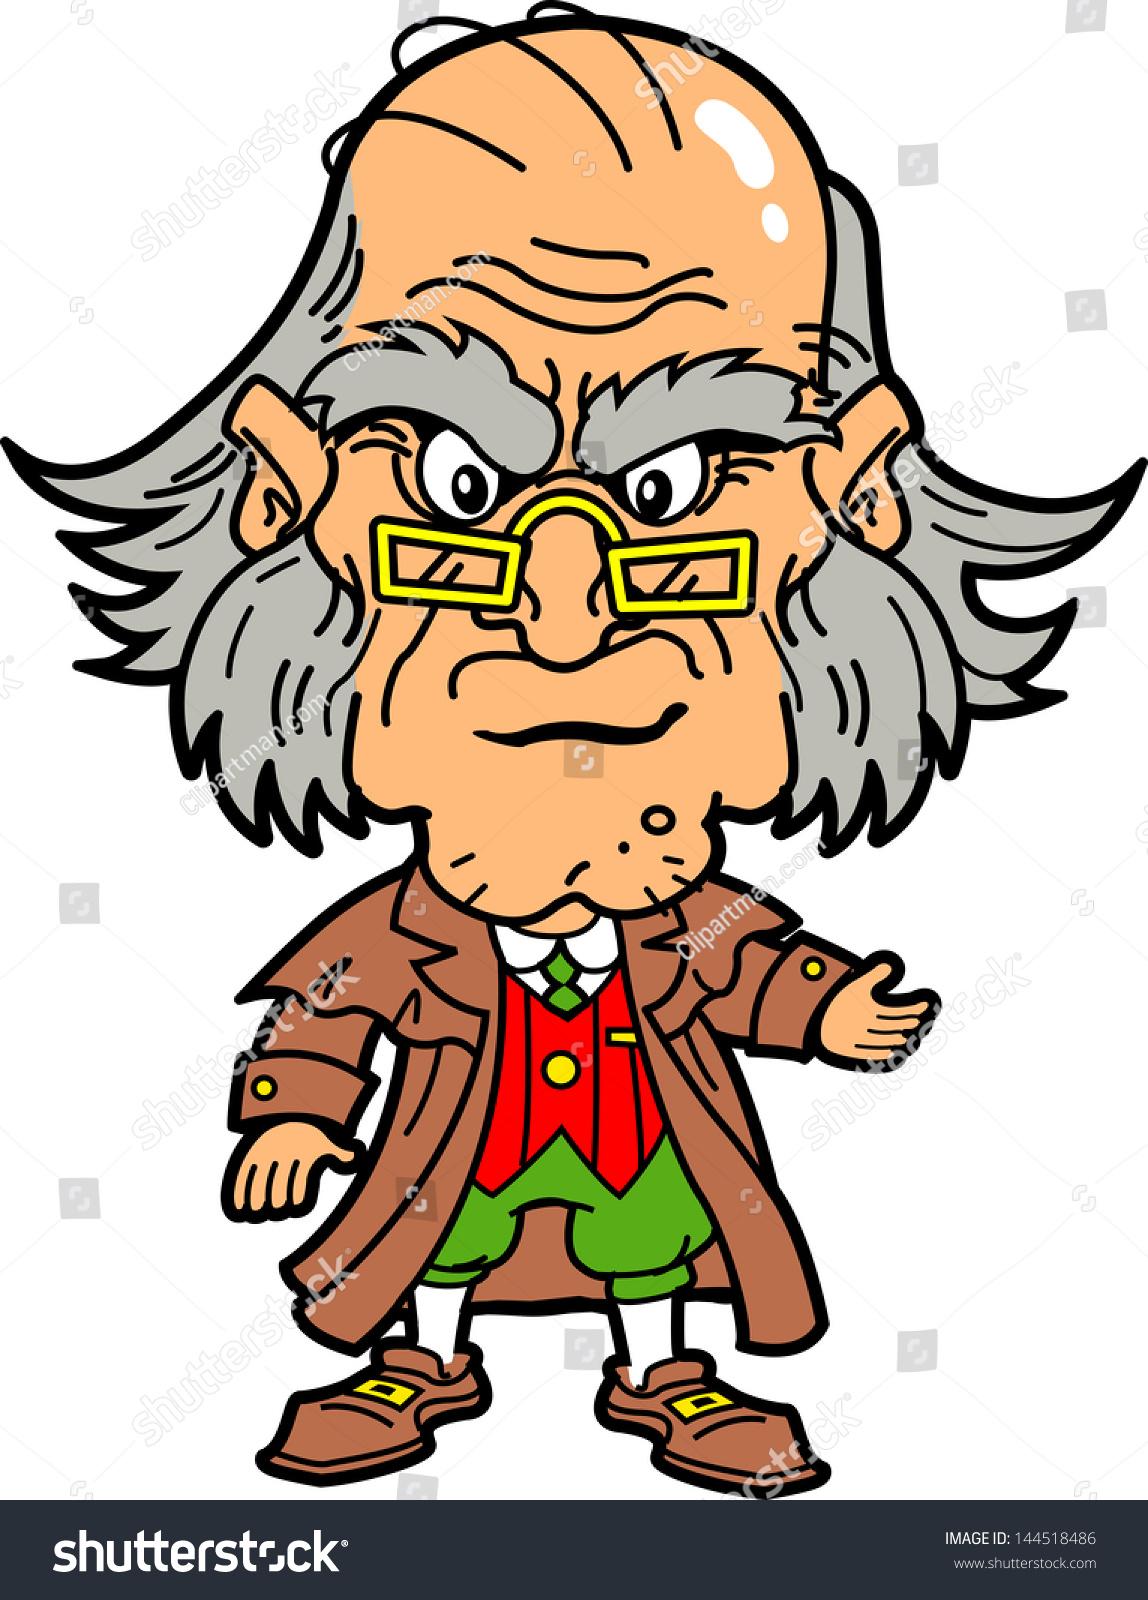 Ebenezer Scrooge Cartoon Side Views